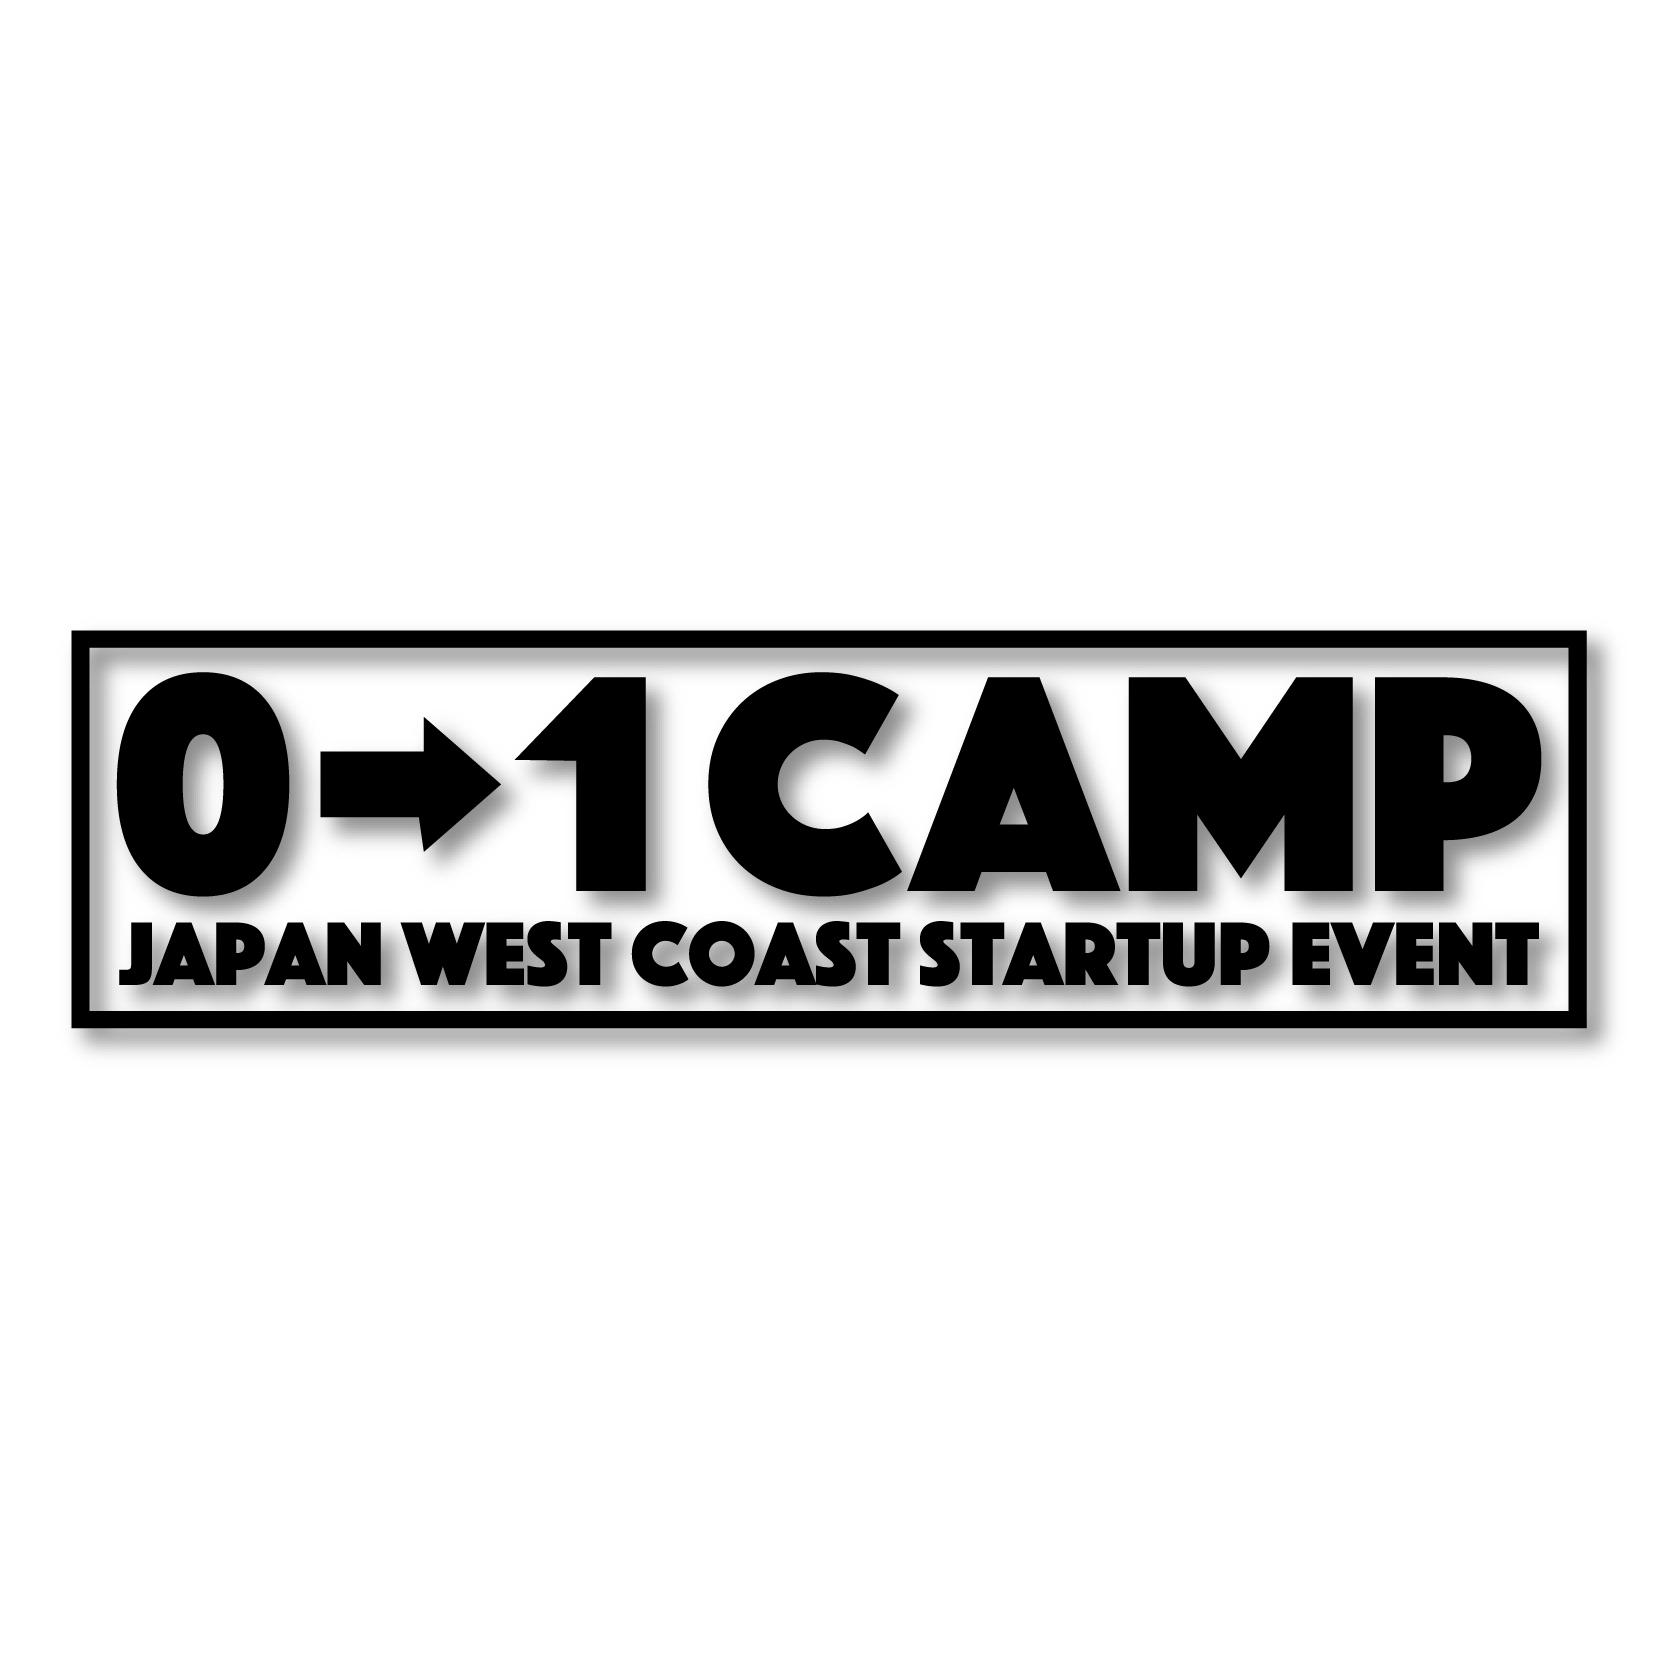 0→1CAMP